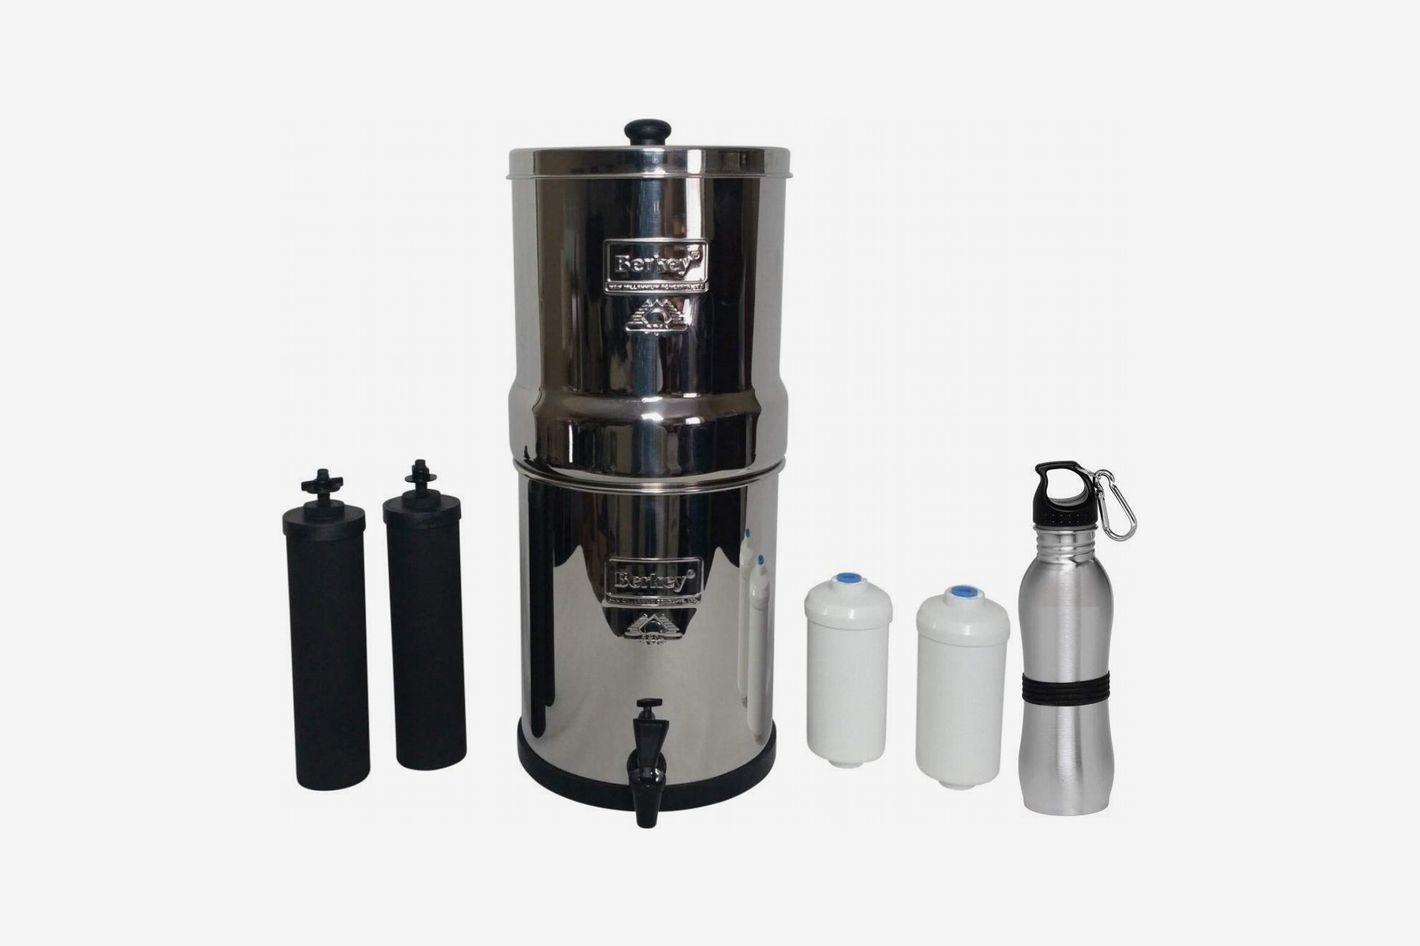 Big Berkey Water Filter 2.5 Gallon System Bundle